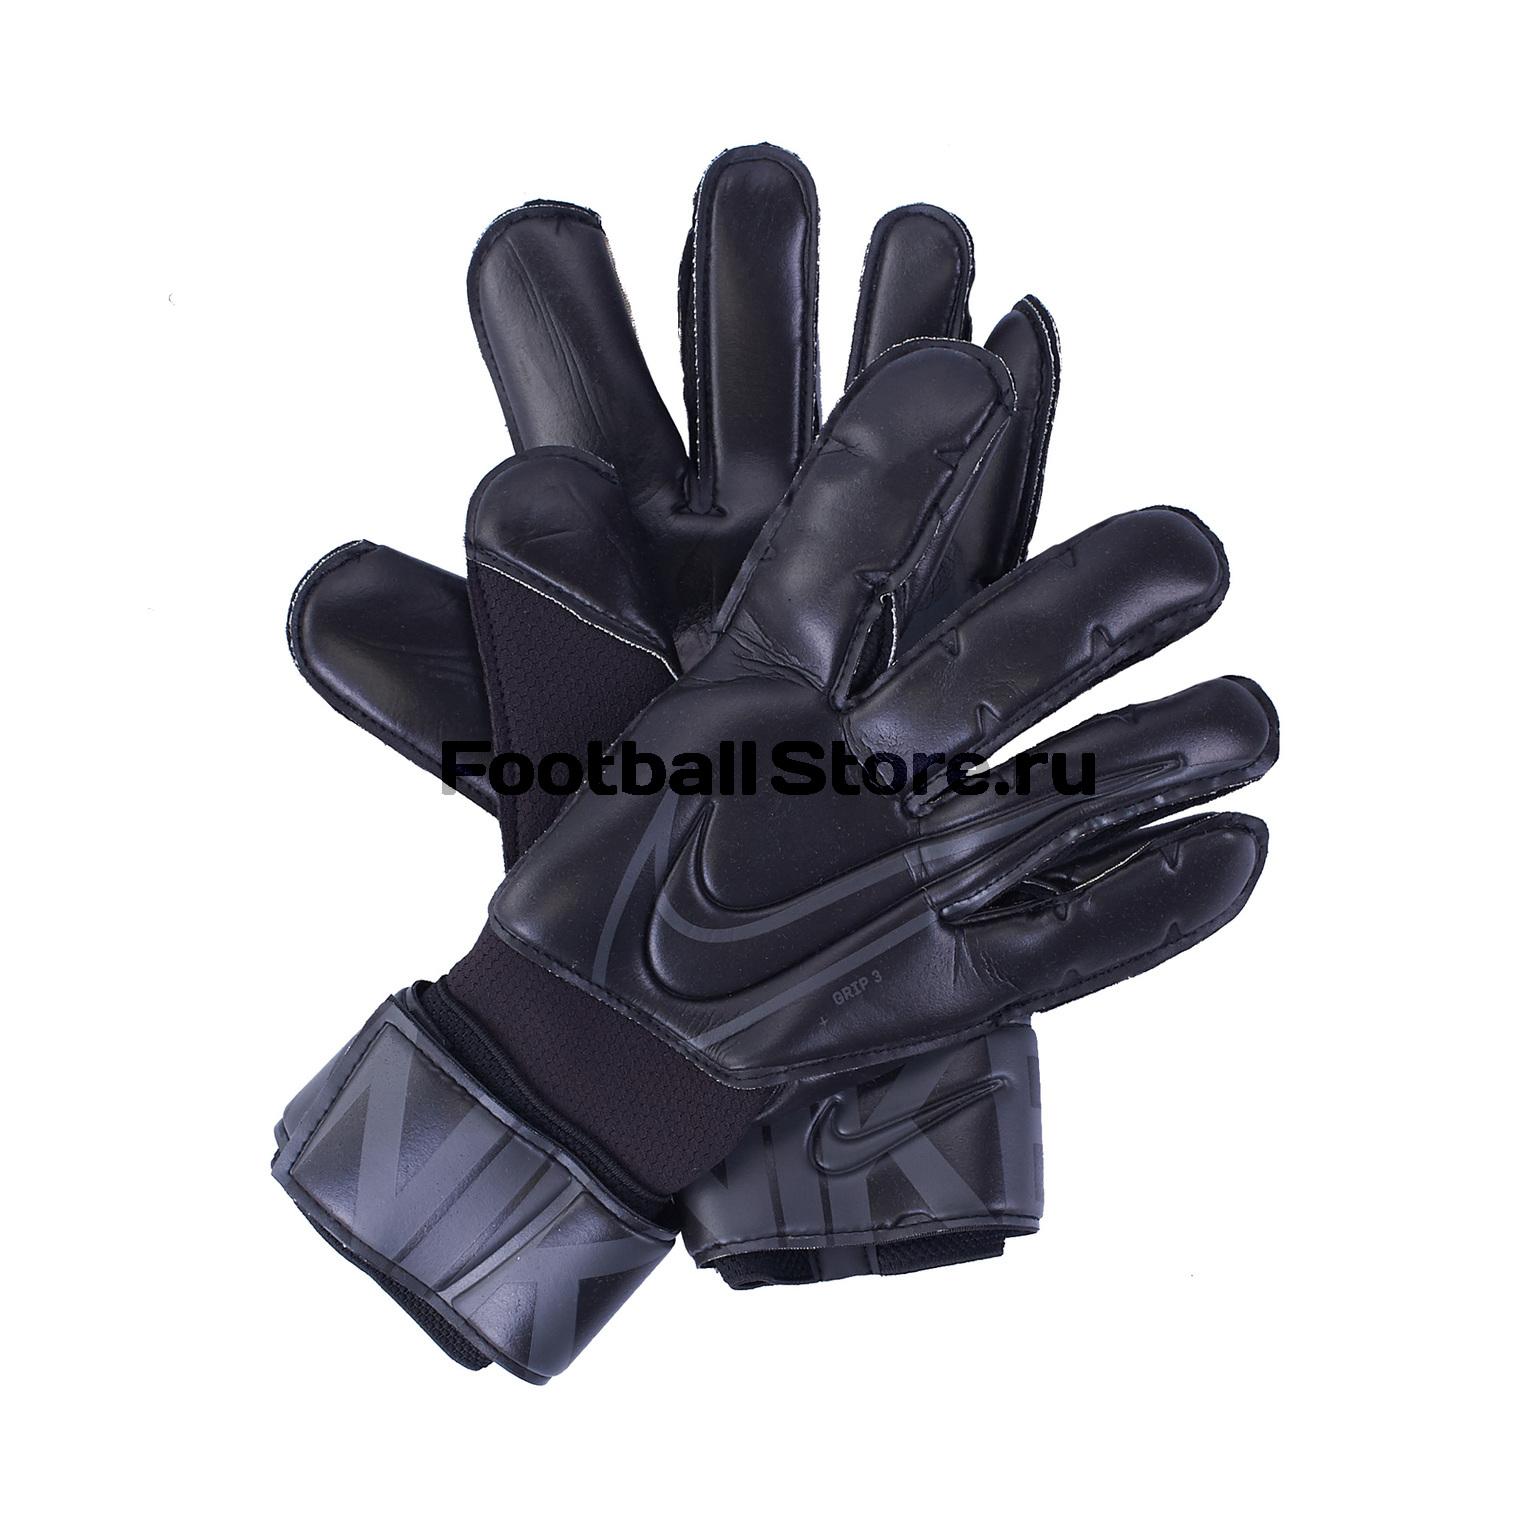 цена на Перчатки вратарские Nike GK GRIP3-FA19 GS3381-010